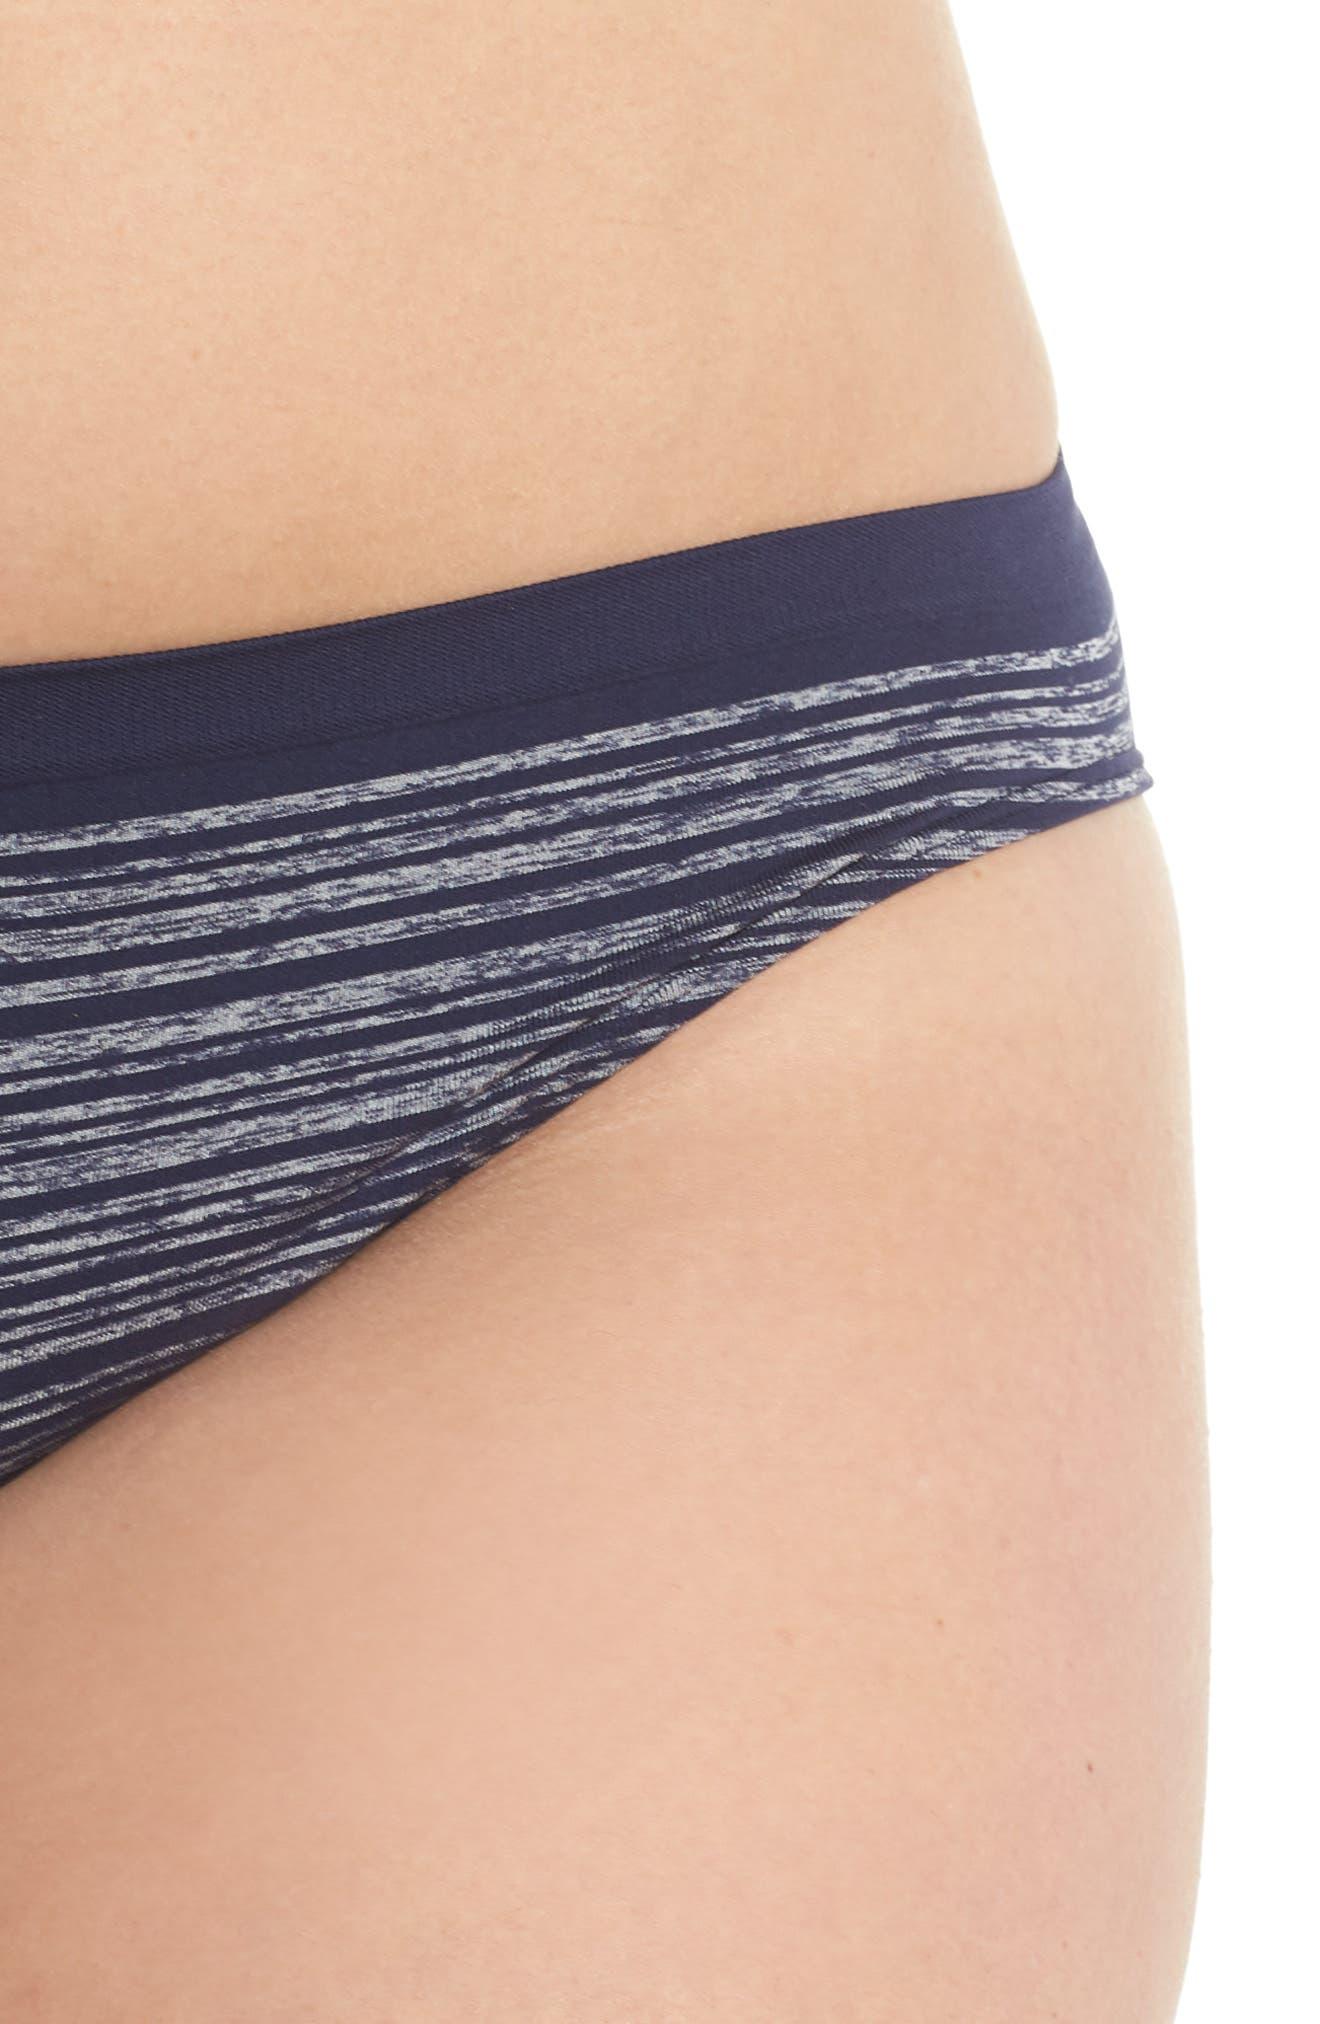 Seamless Bikini,                             Alternate thumbnail 4, color,                             Navy Peacoat Heather Stripe